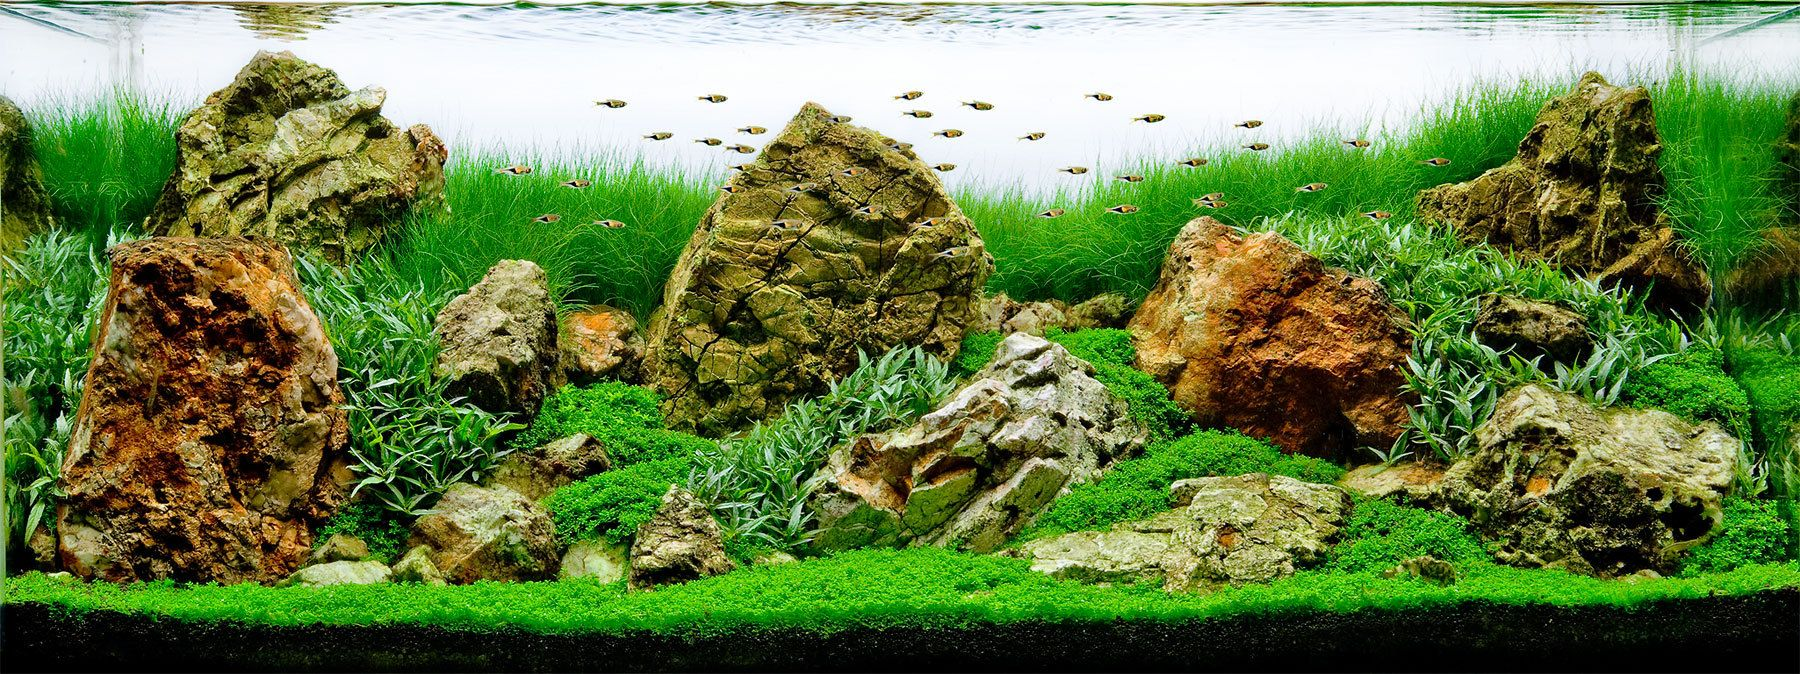 Charming Aquarium Design Group   An American Style Iwagumi Planted Aquarium